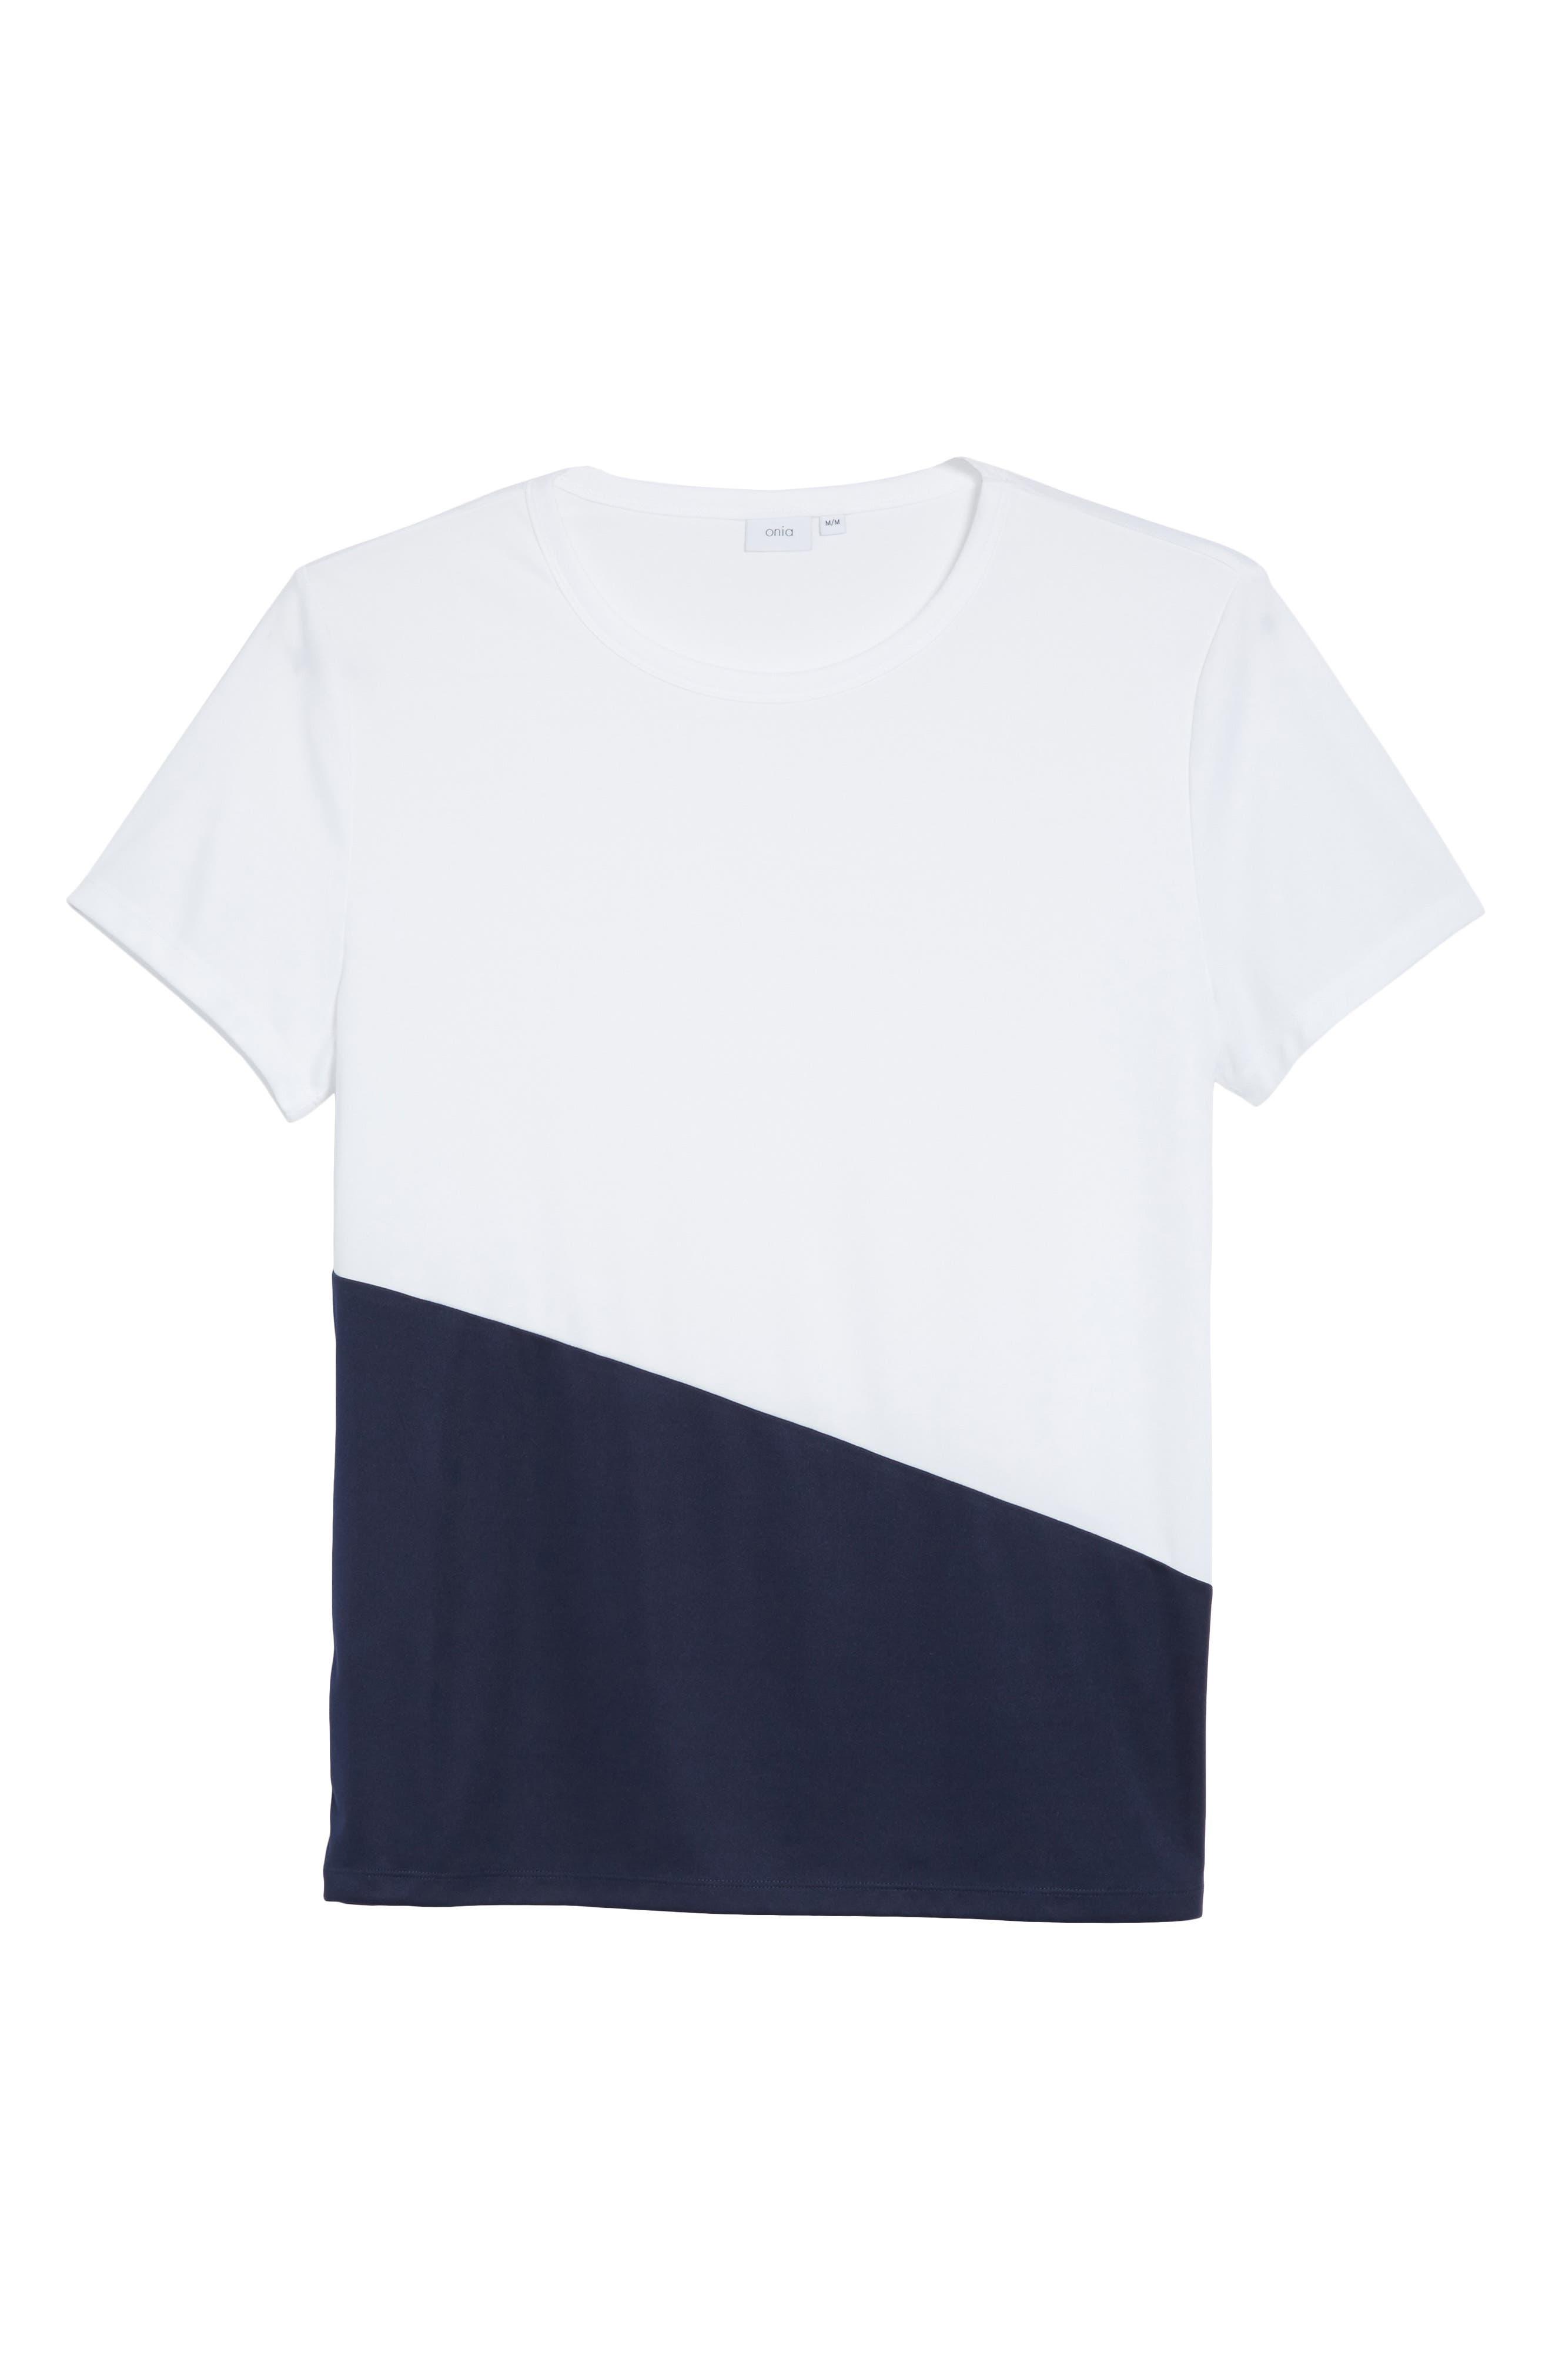 Colorblock Crewneck T-Shirt,                             Alternate thumbnail 6, color,                             Deep Navy/ White